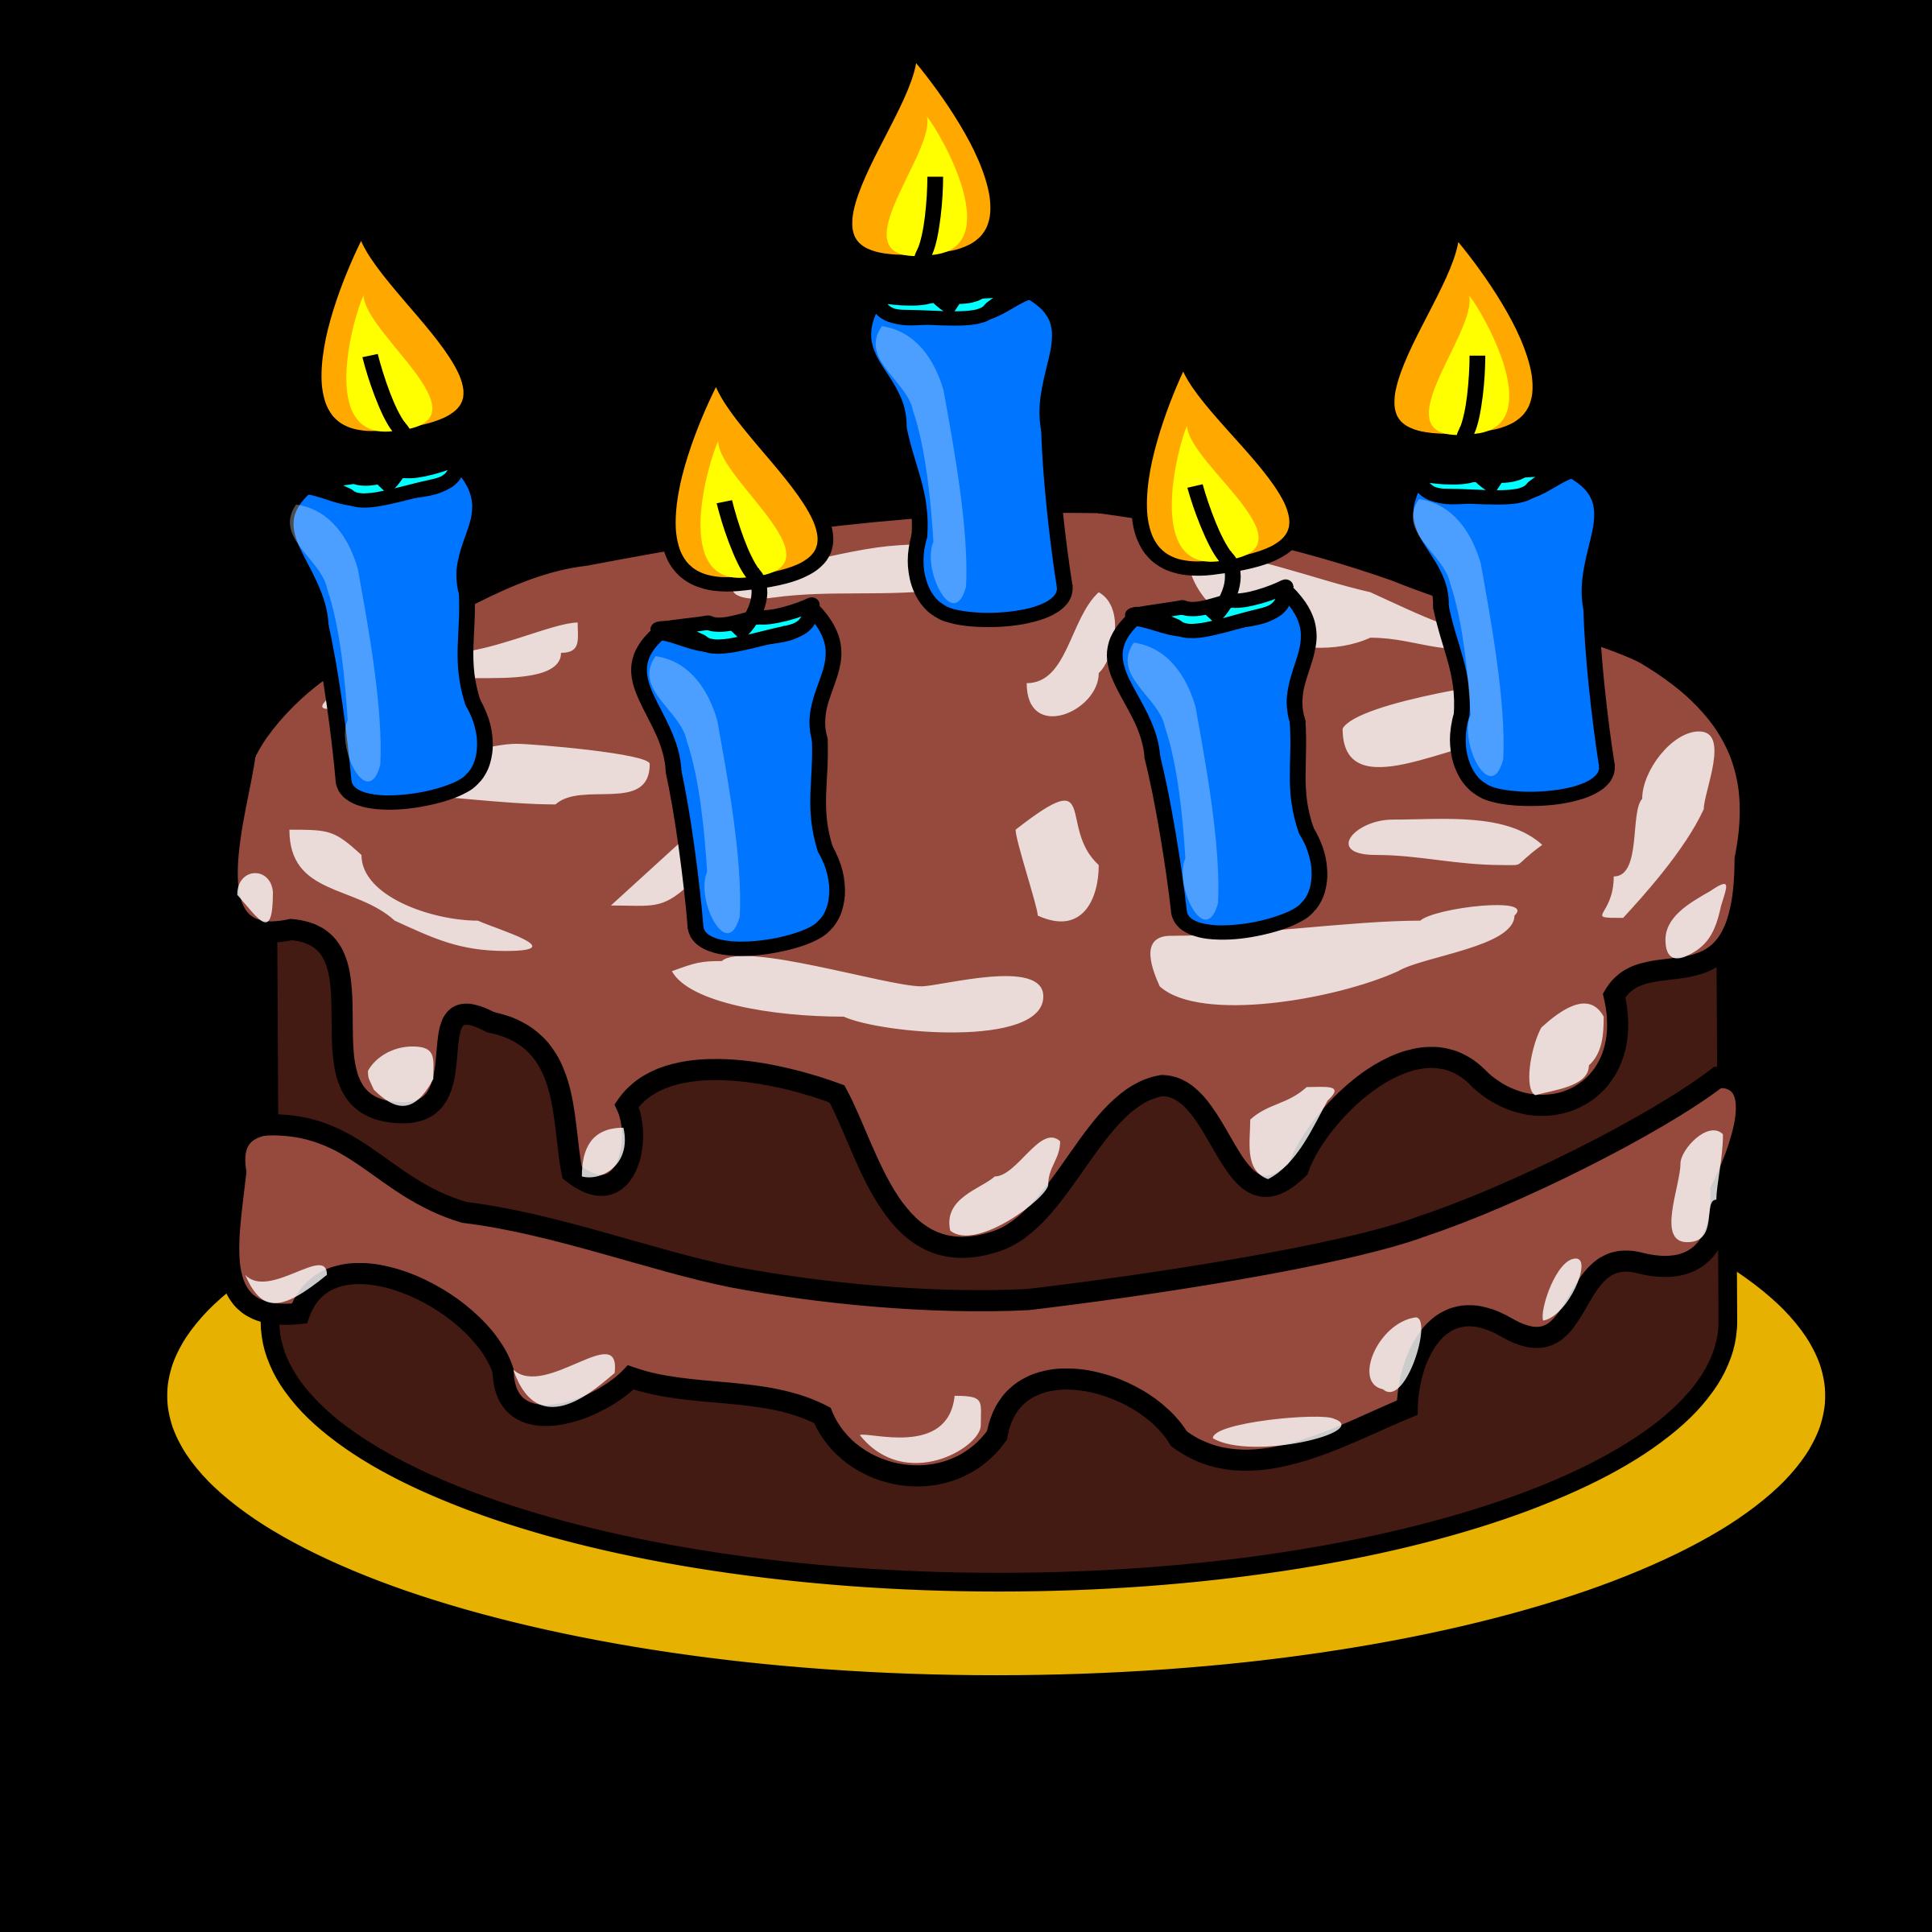 2400x2400 Cake Clipart Happy Birthday